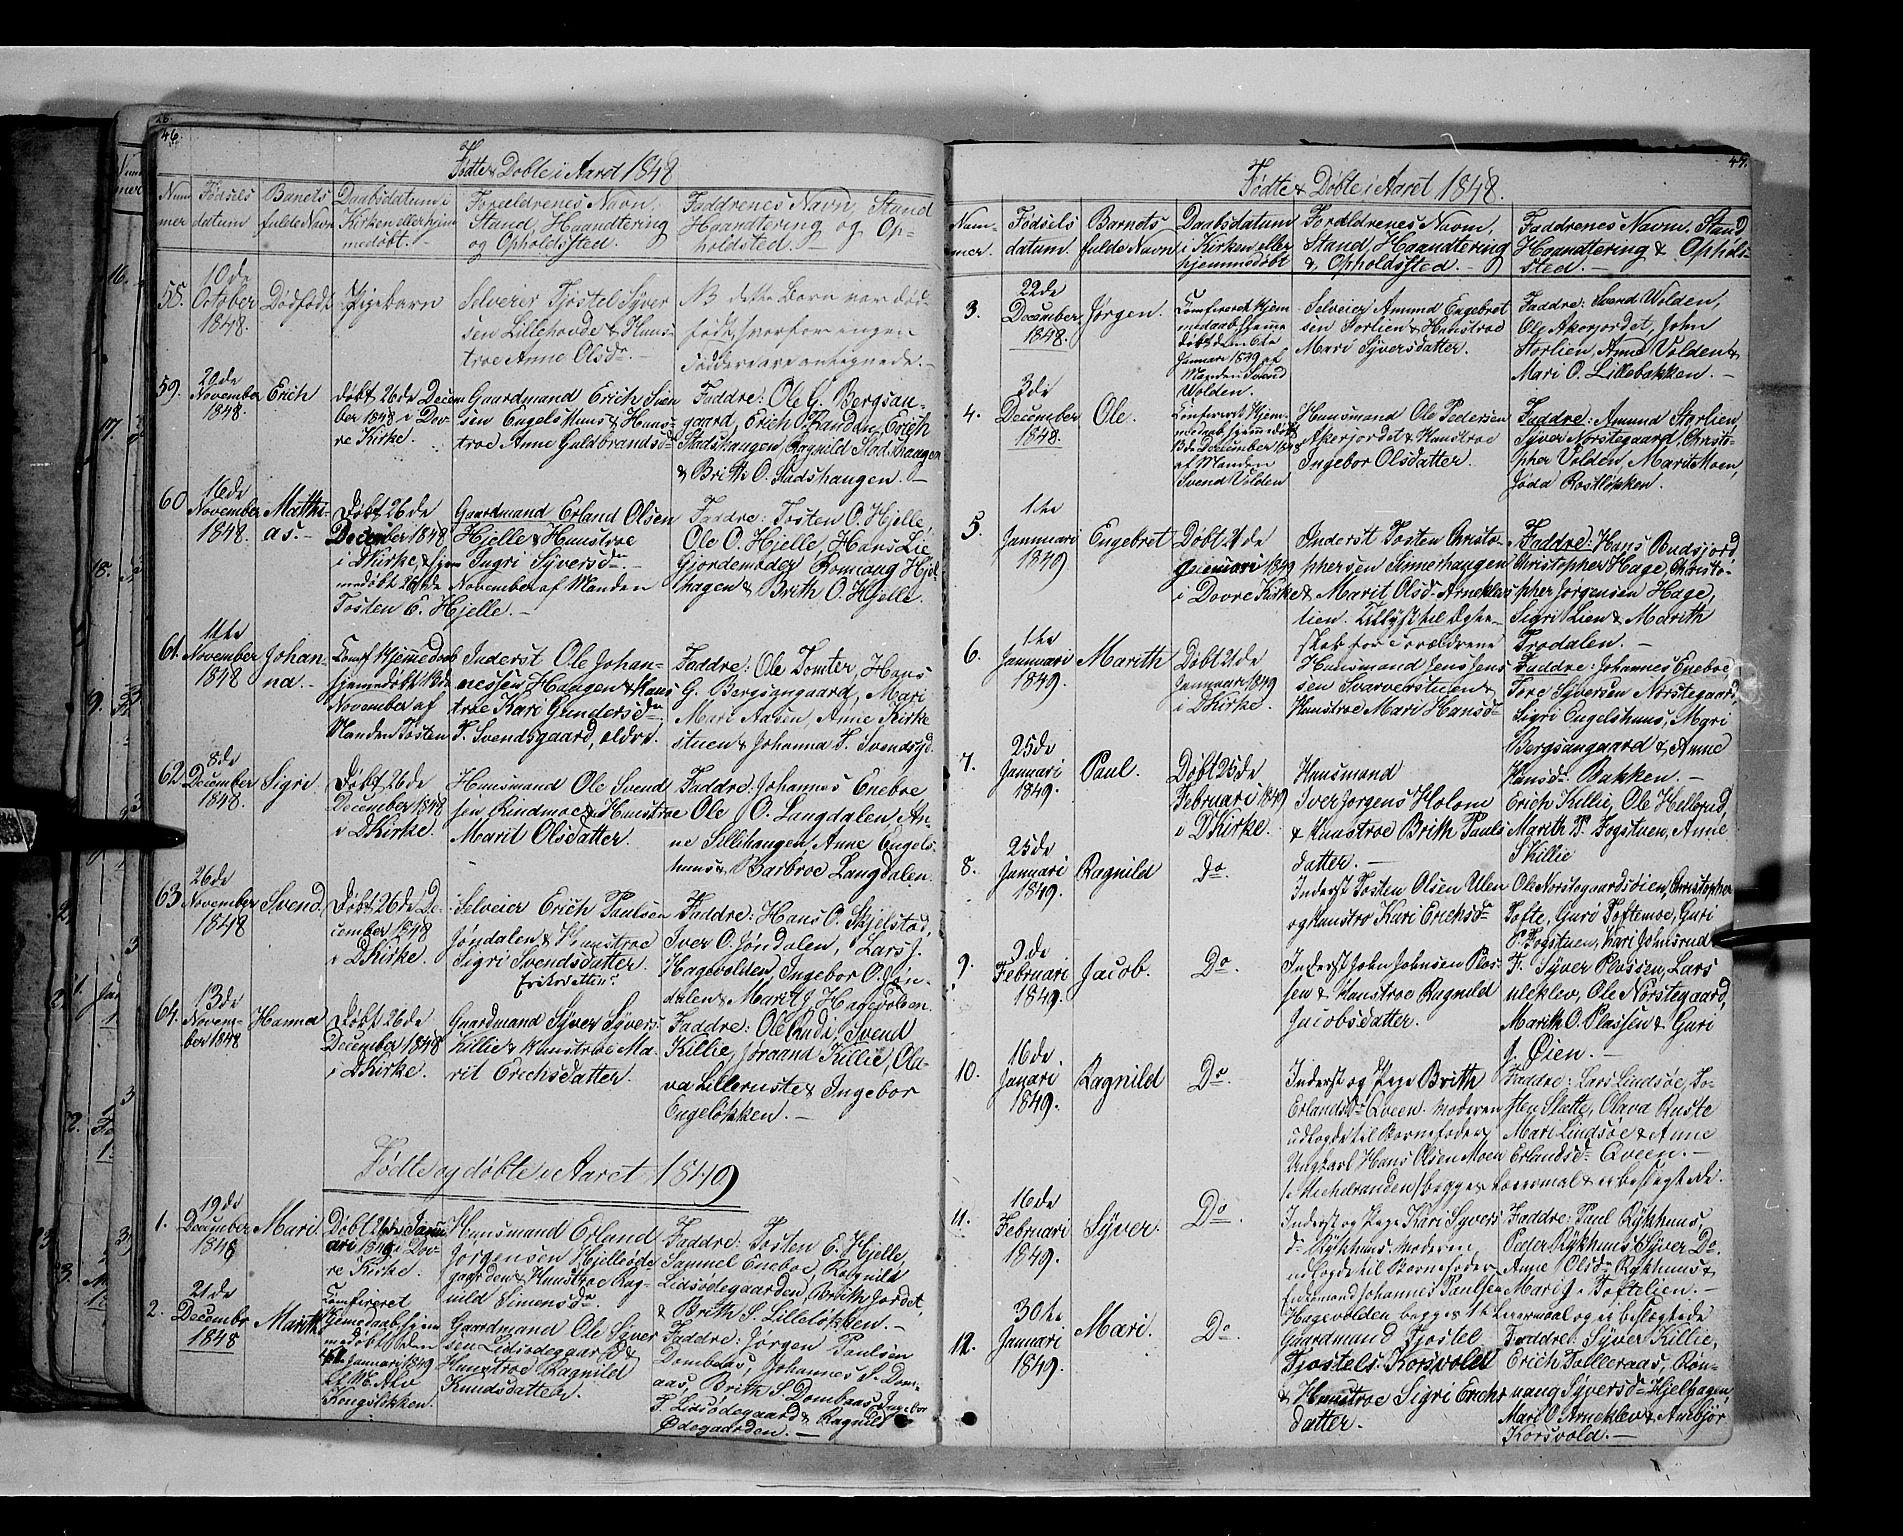 SAH, Lesja prestekontor, Klokkerbok nr. 3, 1842-1862, s. 46-47